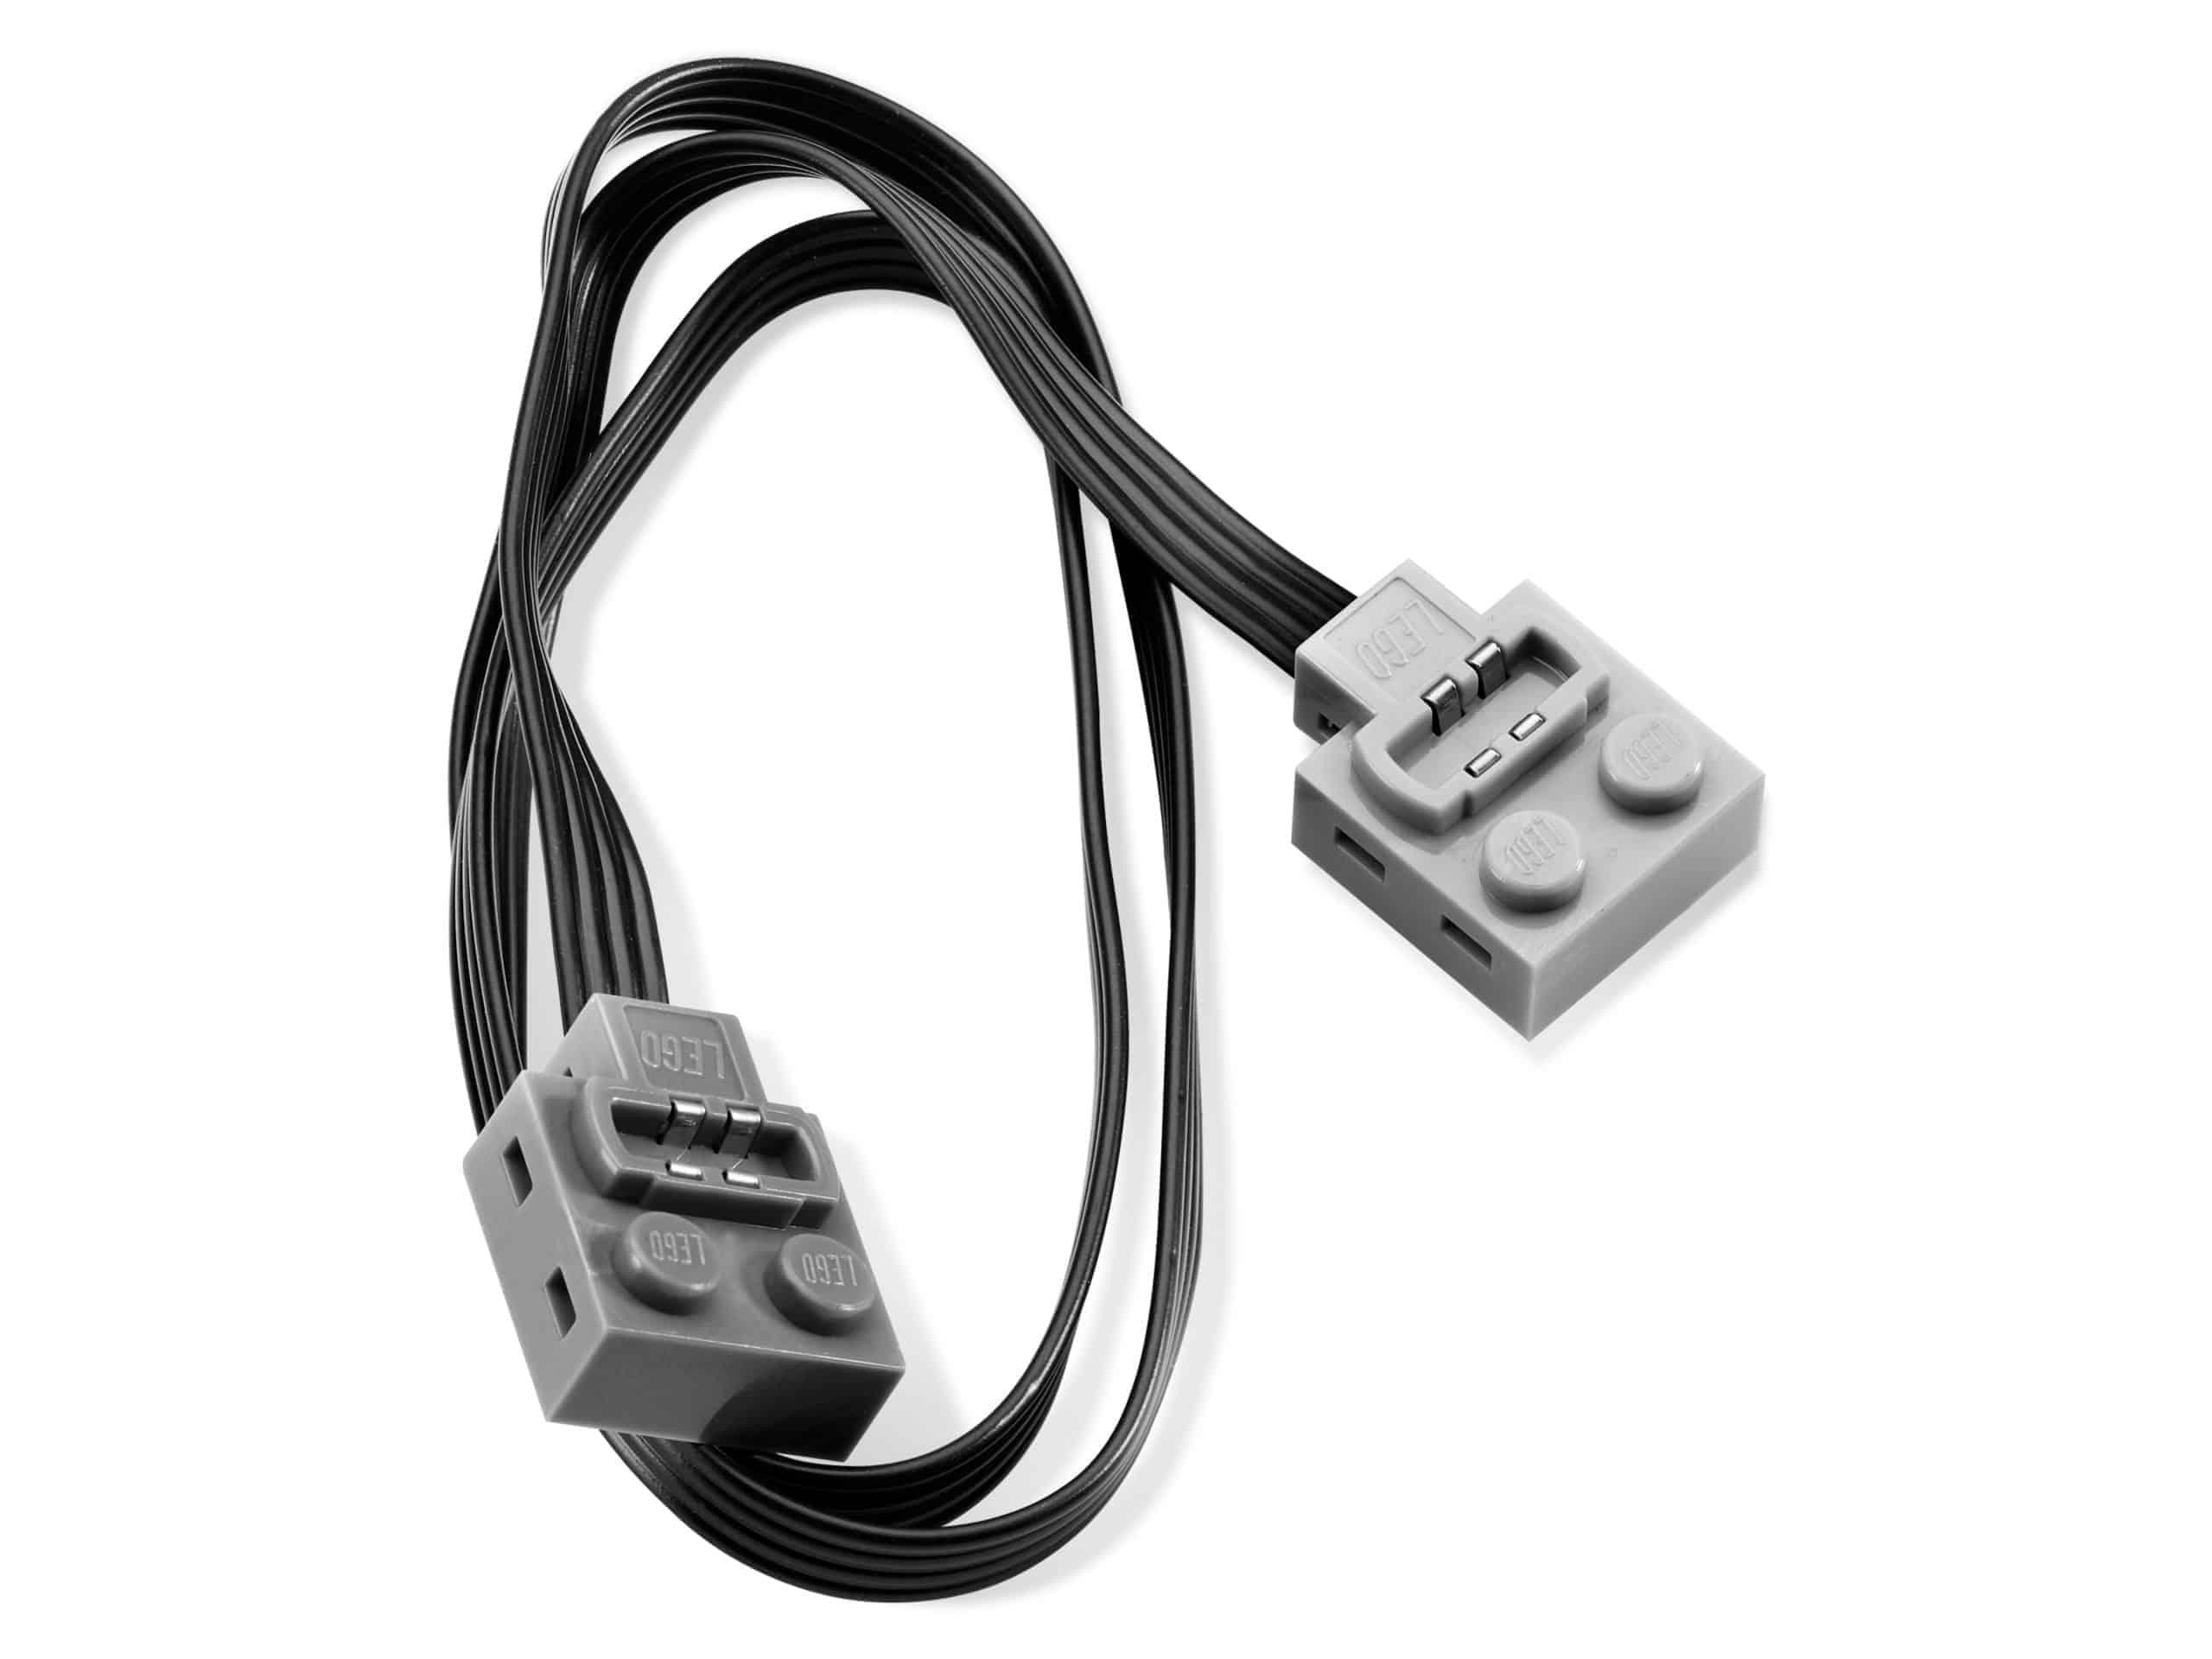 lego 8871 power functions verlangerungskabel 50 cm scaled